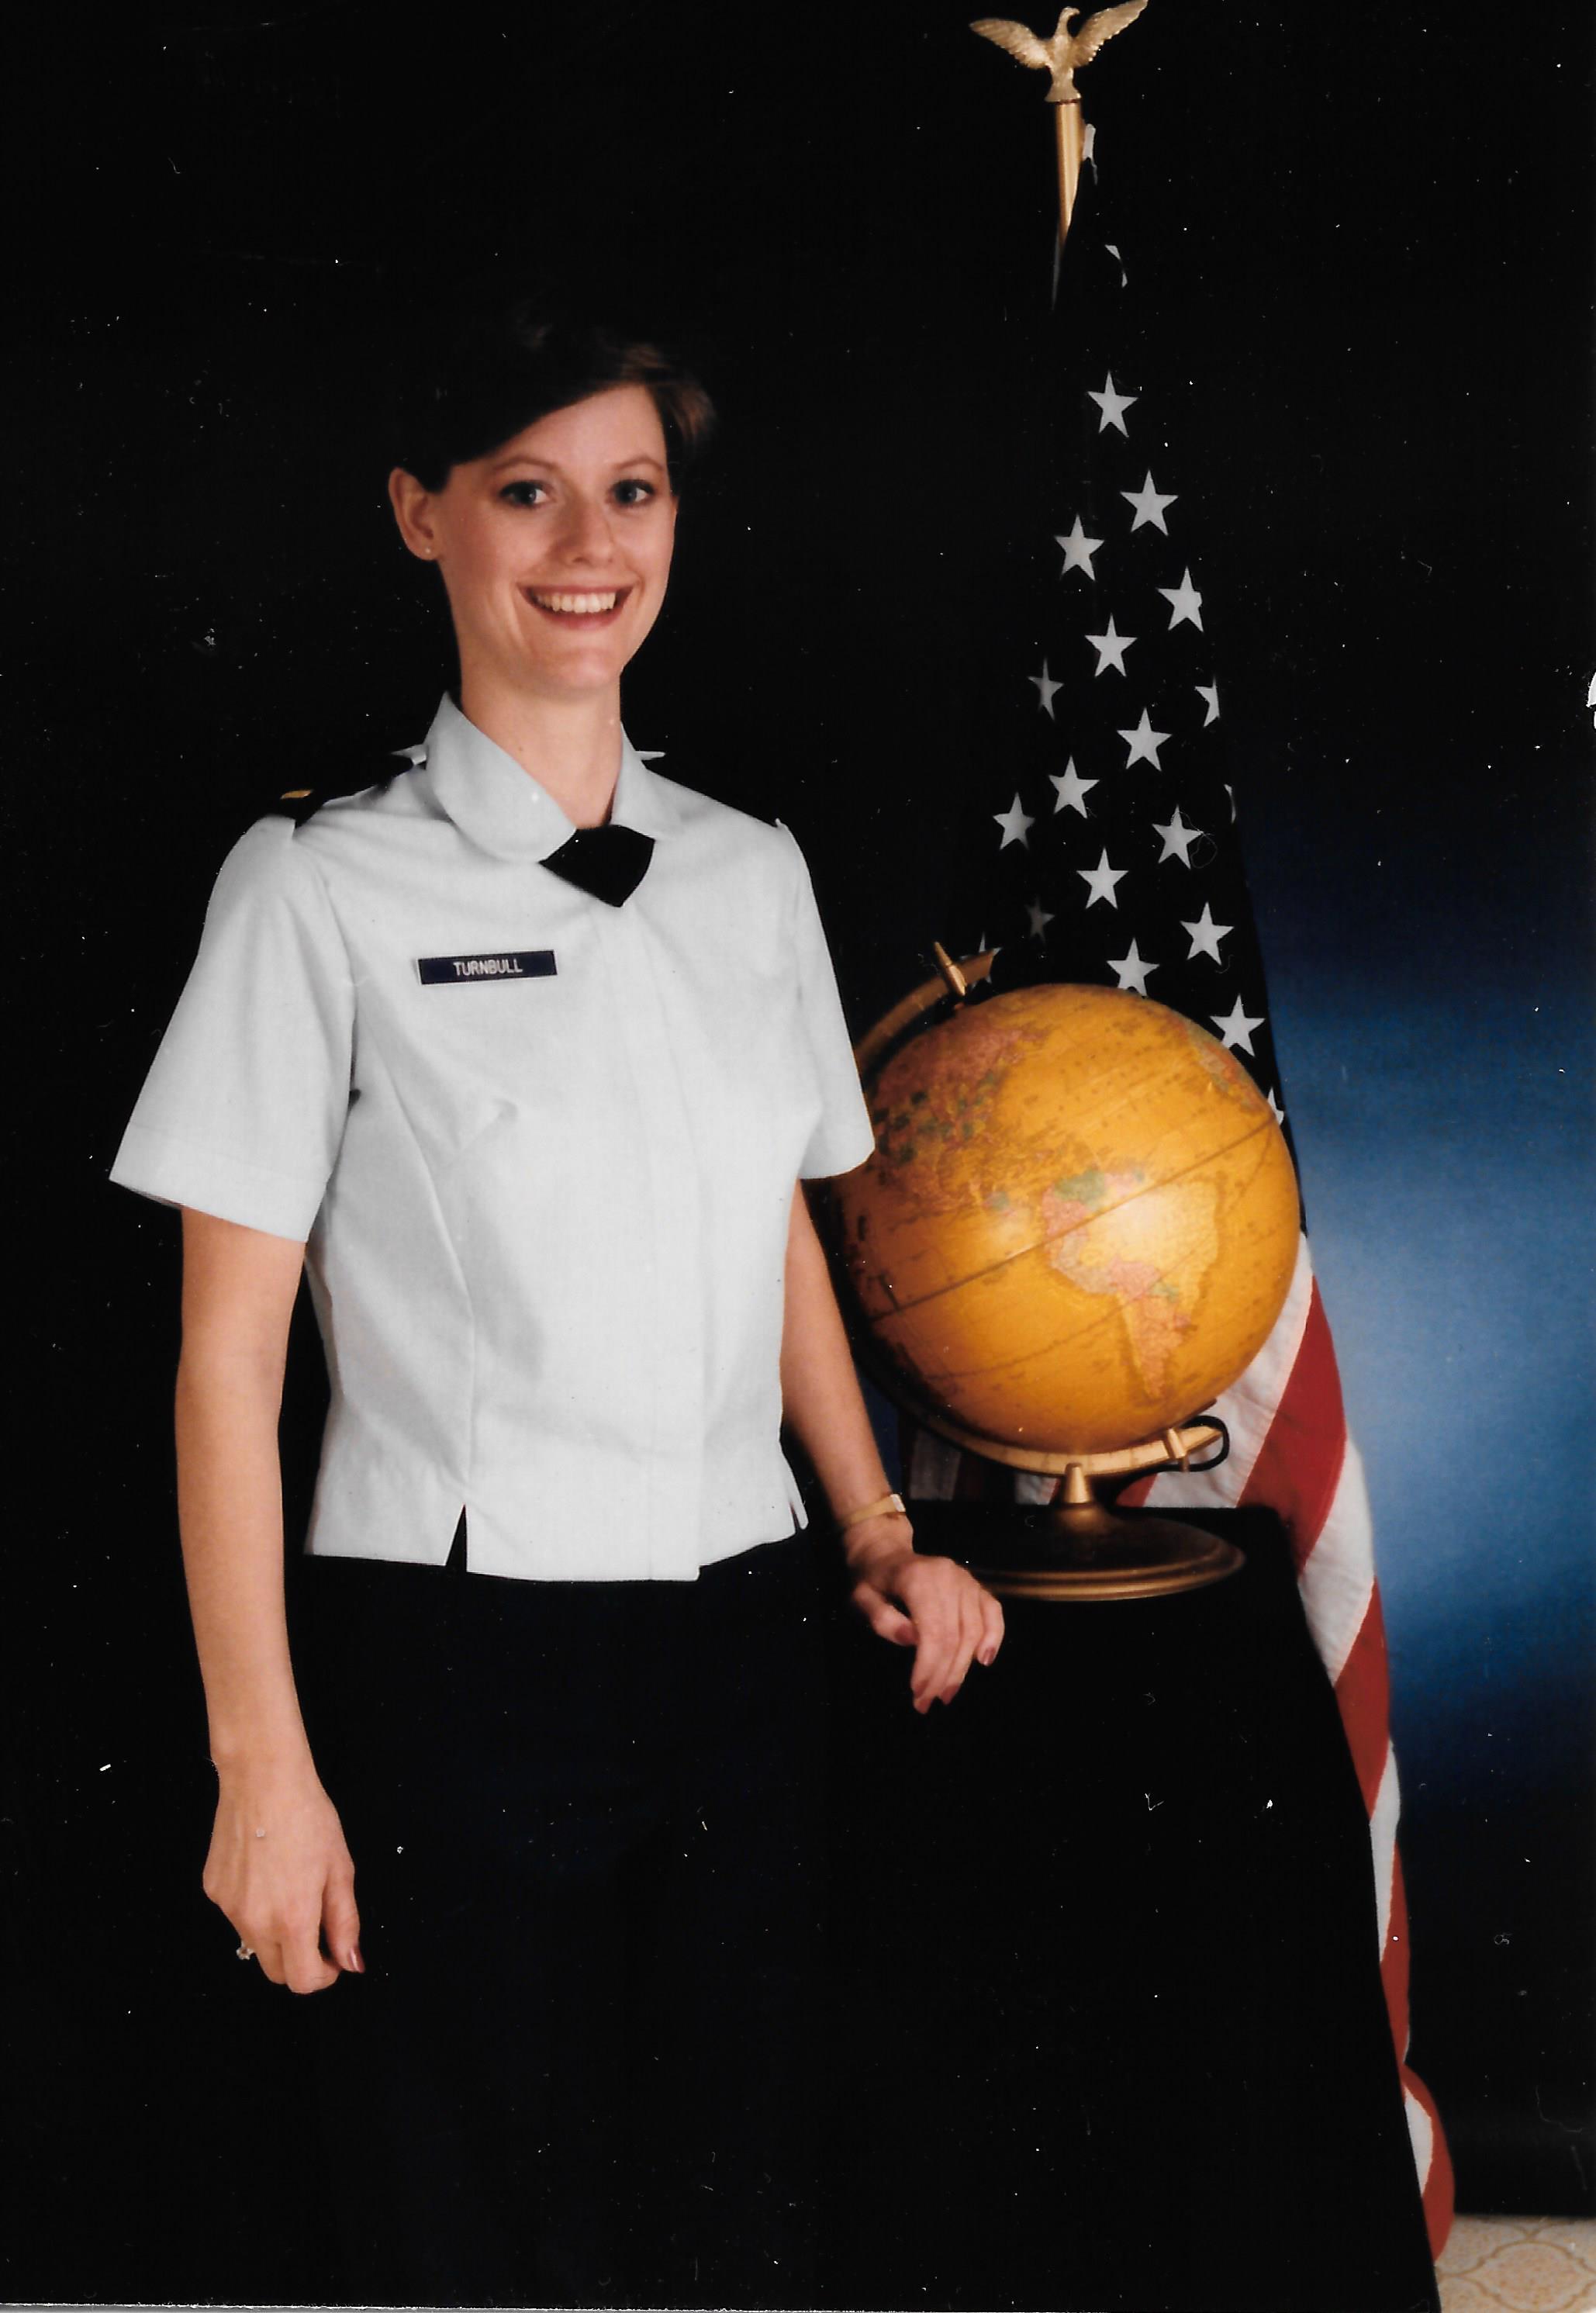 2ndlieutenant-pam-turnbull-everyday-uniform-class-b-1985-002